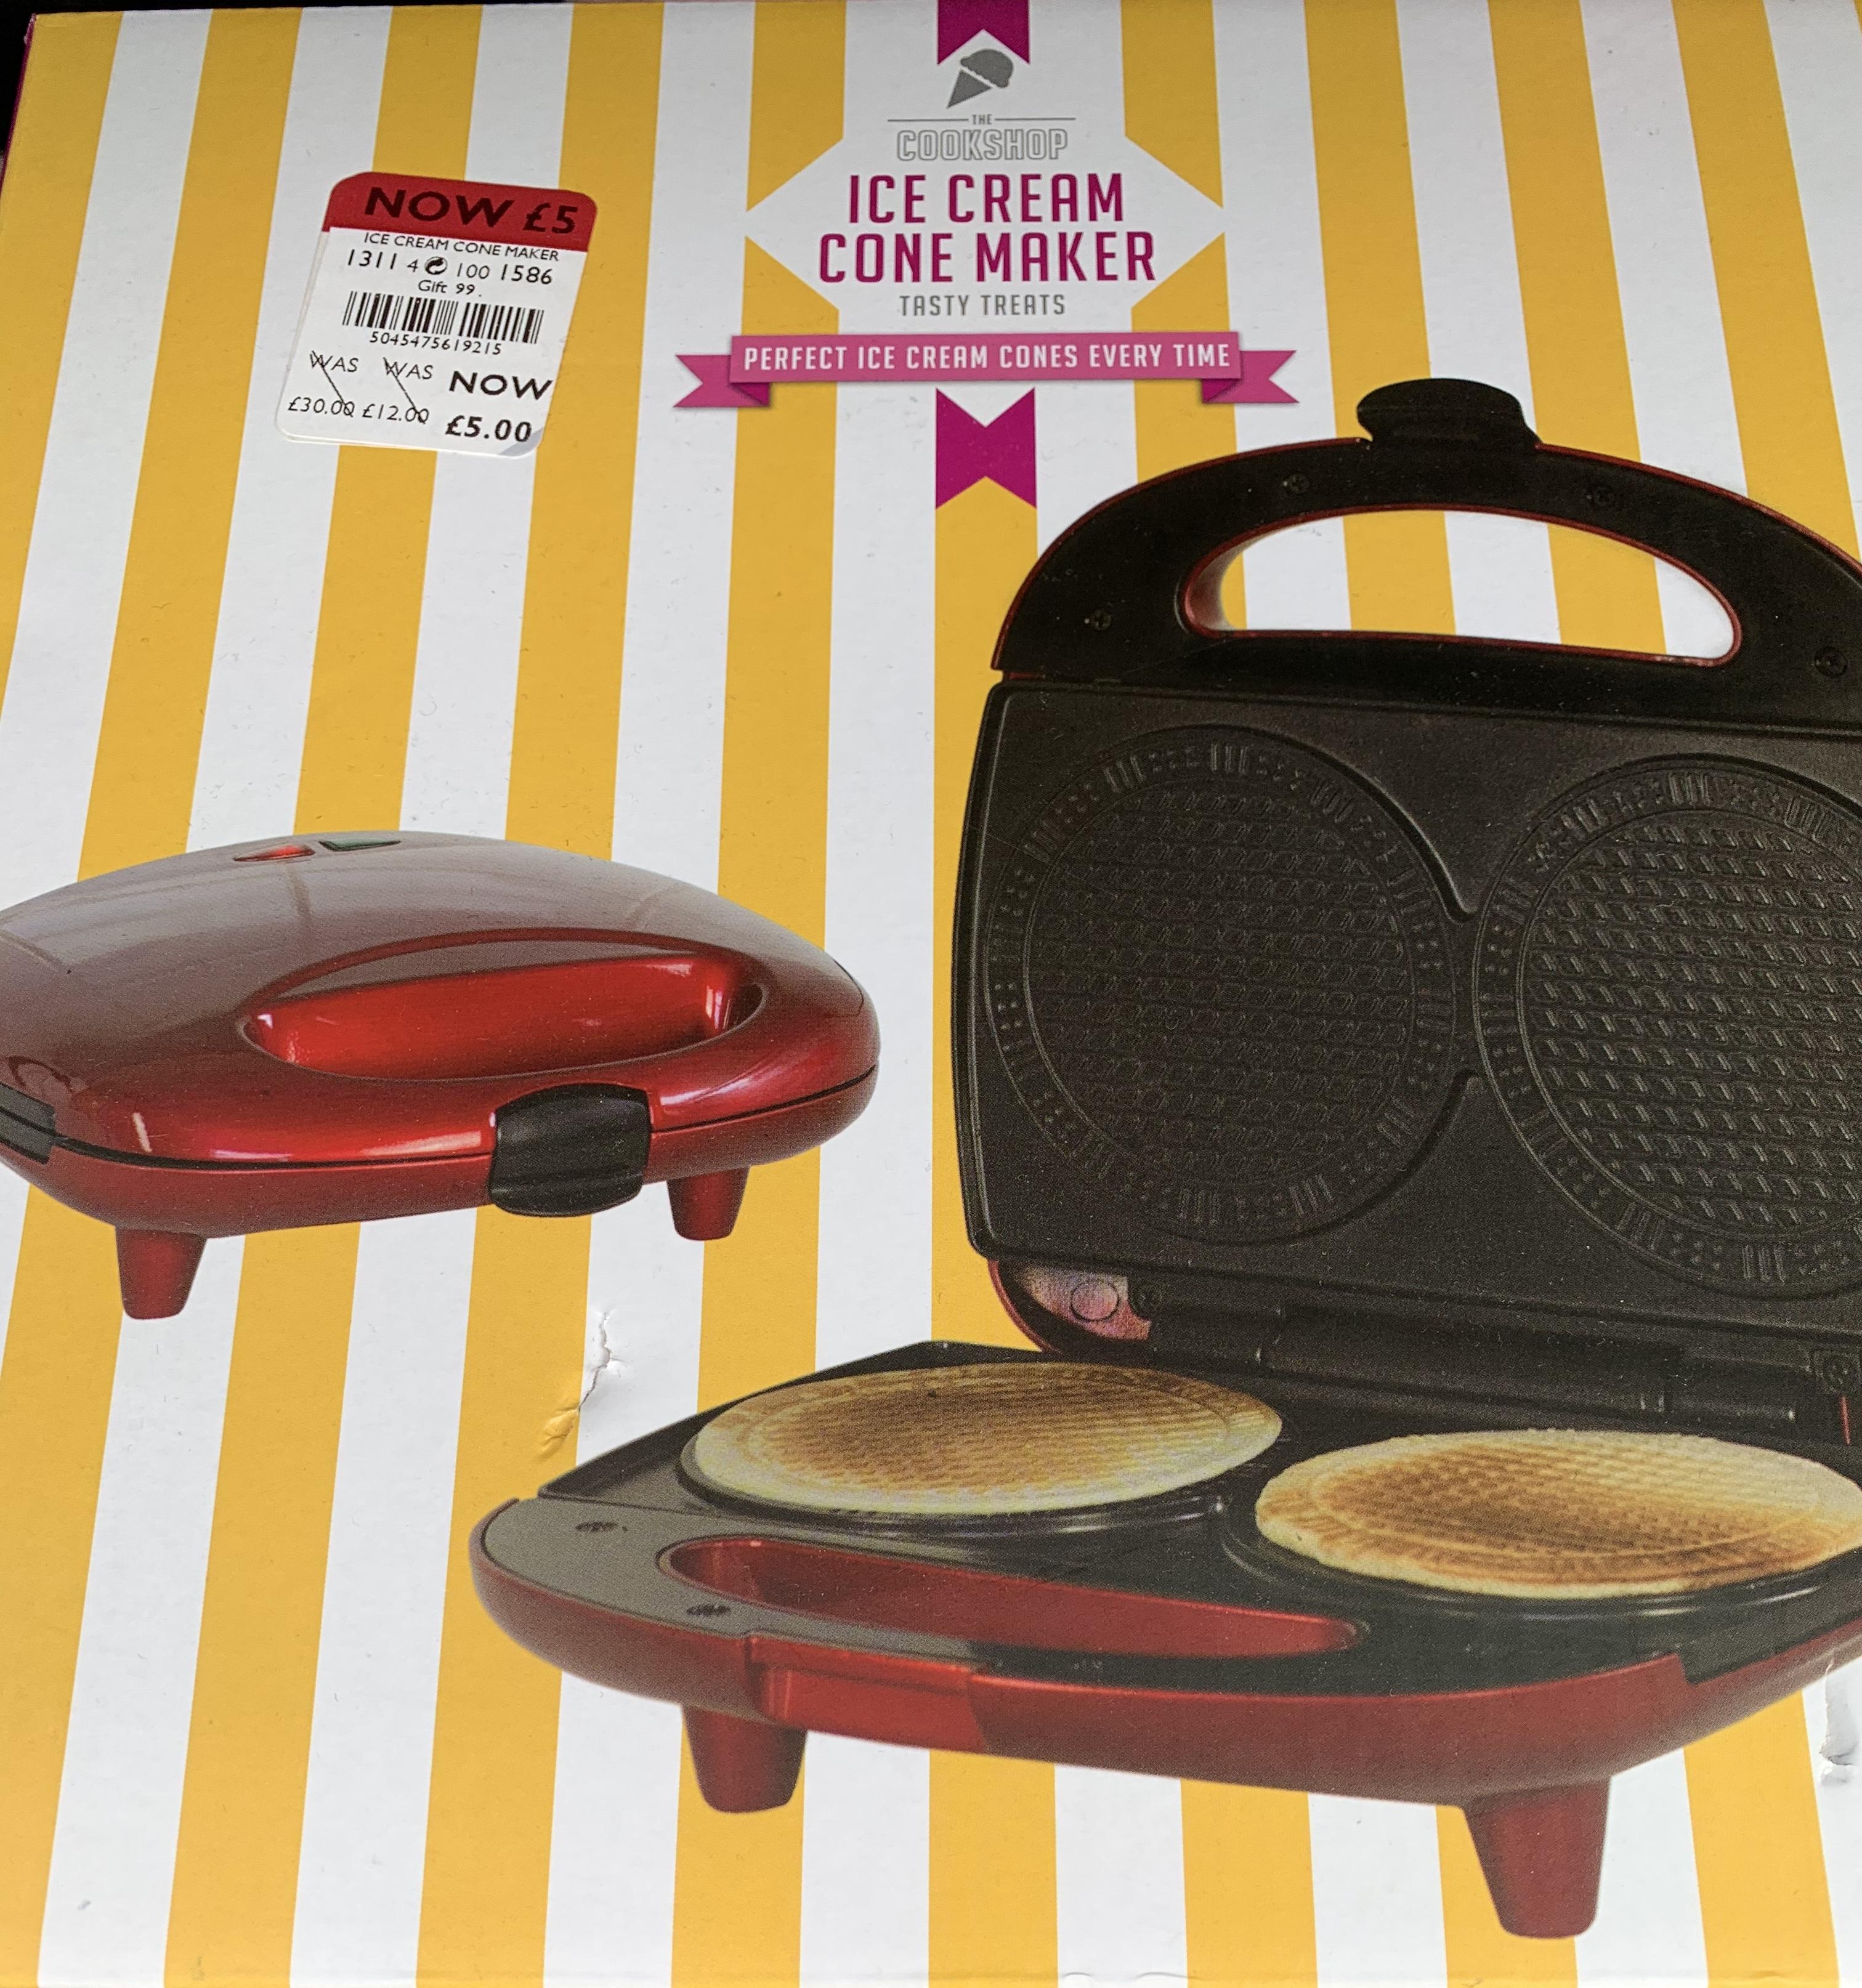 Ice cream cone maker - cookshop machines - £5 Debenhams Instore